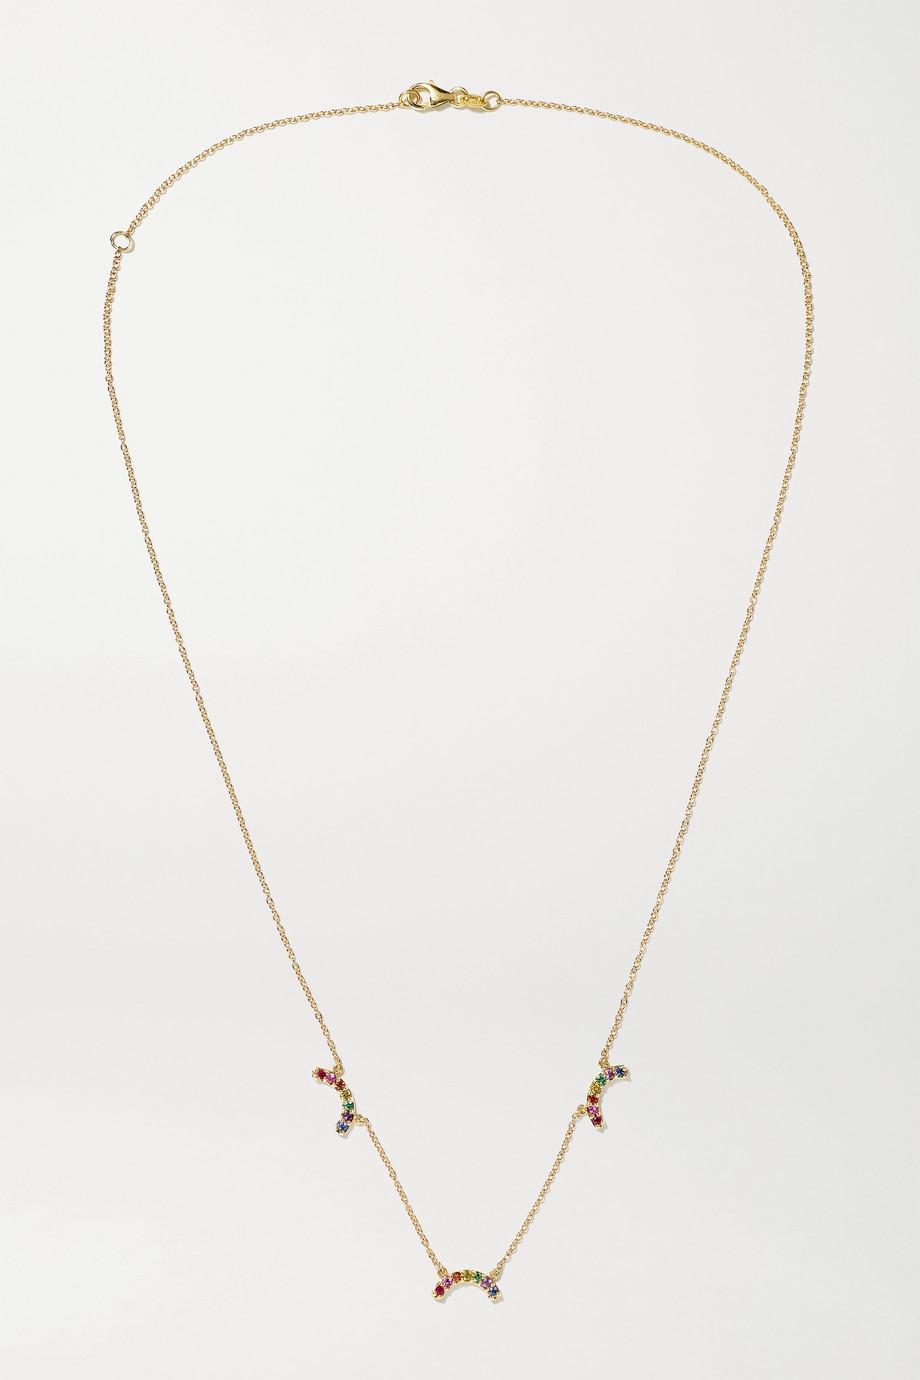 Andrea Fohrman Single Rainbow 14-karat gold multi-stone necklace